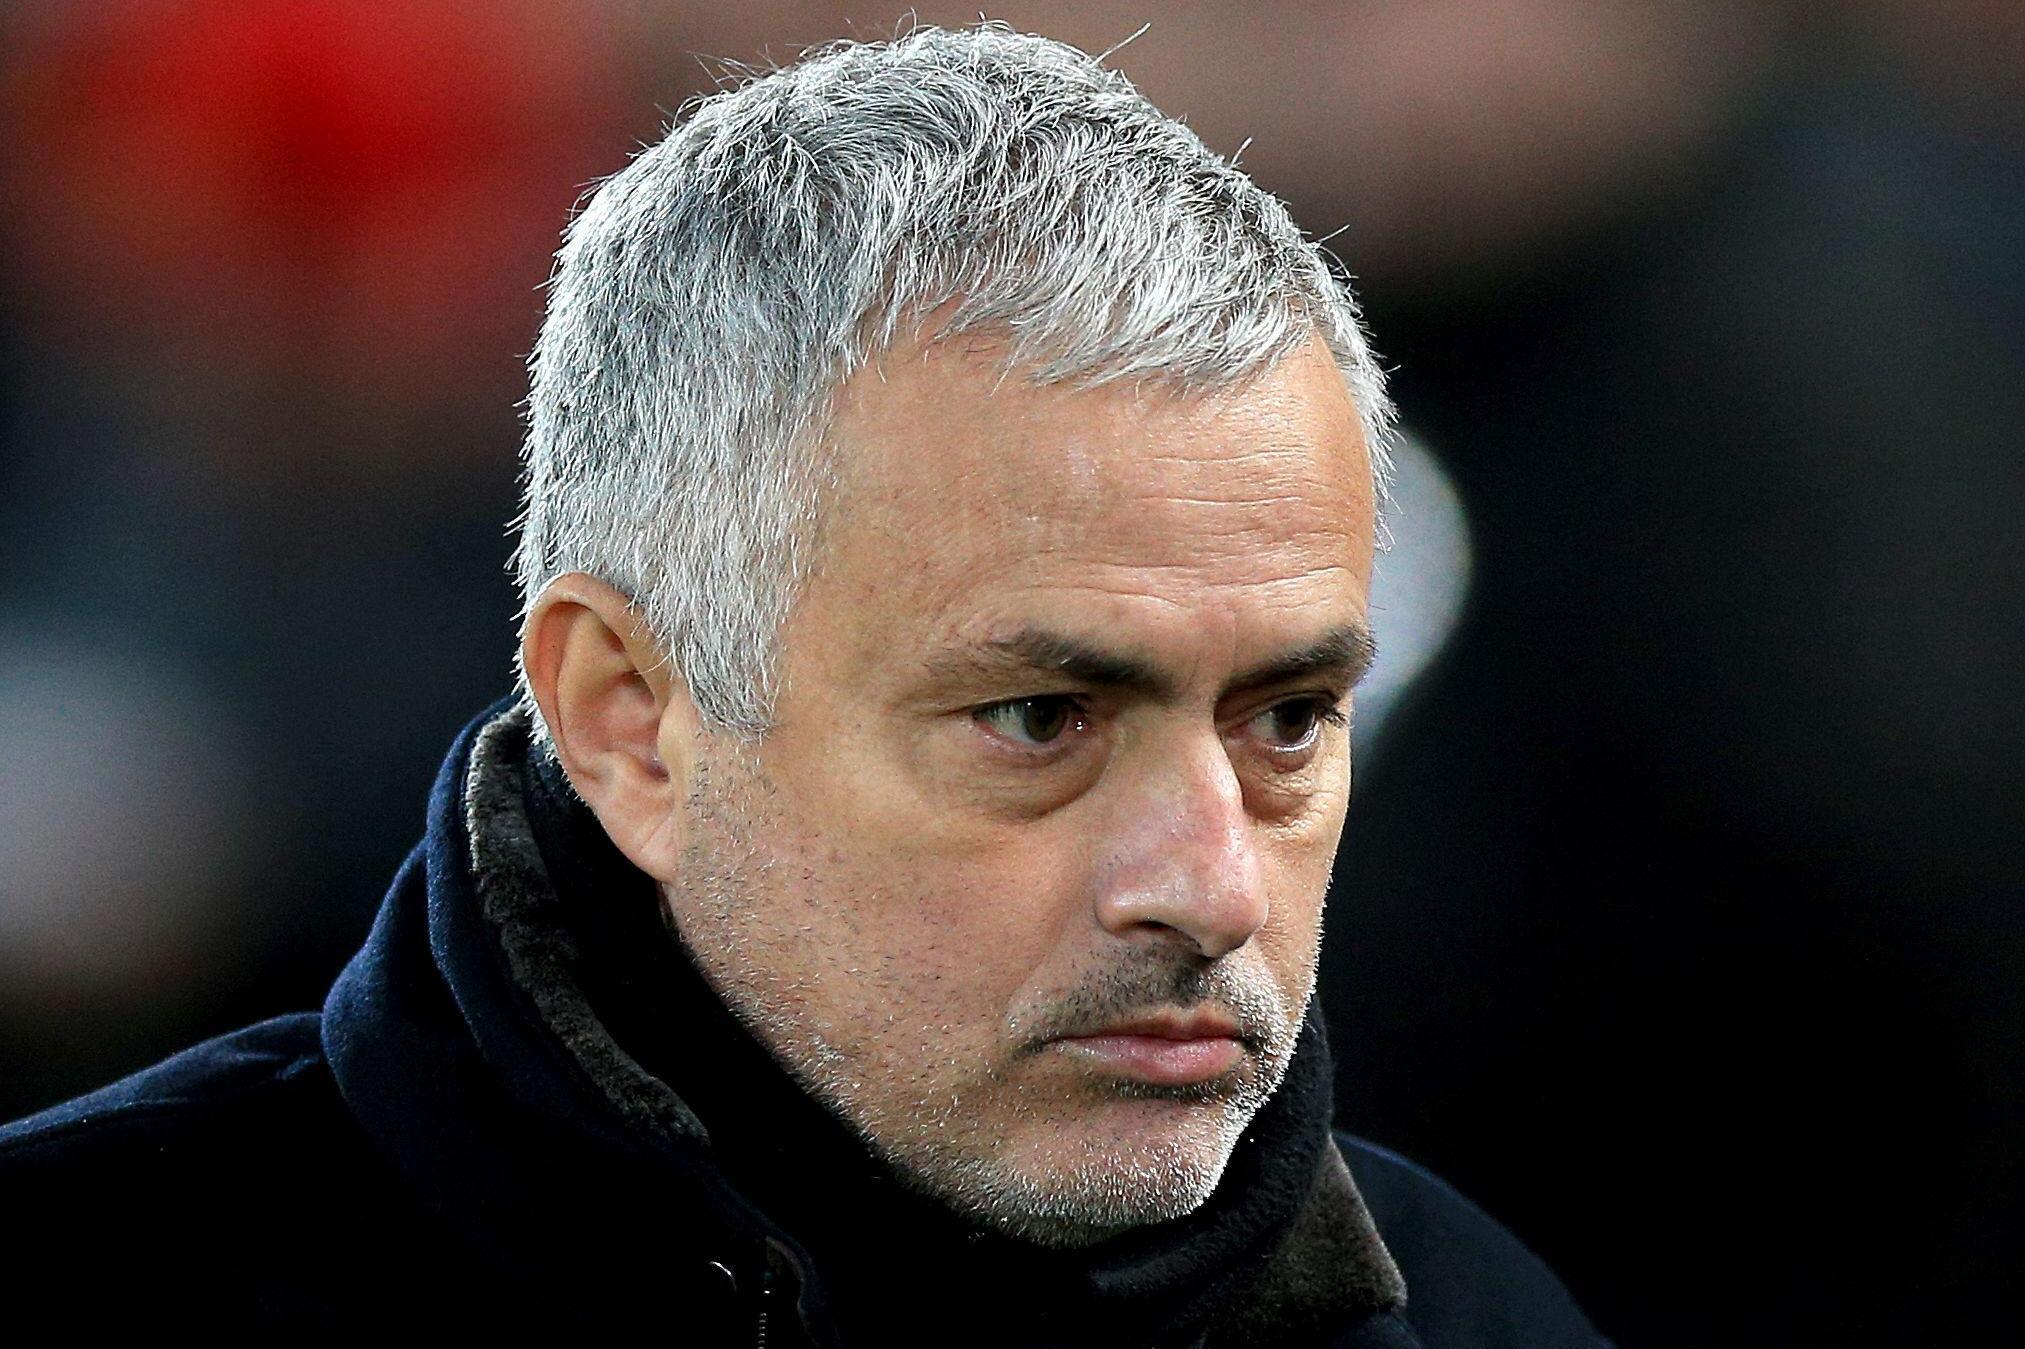 9am Man Utd news: Mourinho faces Christmas sacking, Martial deal hitch and Pogba trip fuels Juve talk